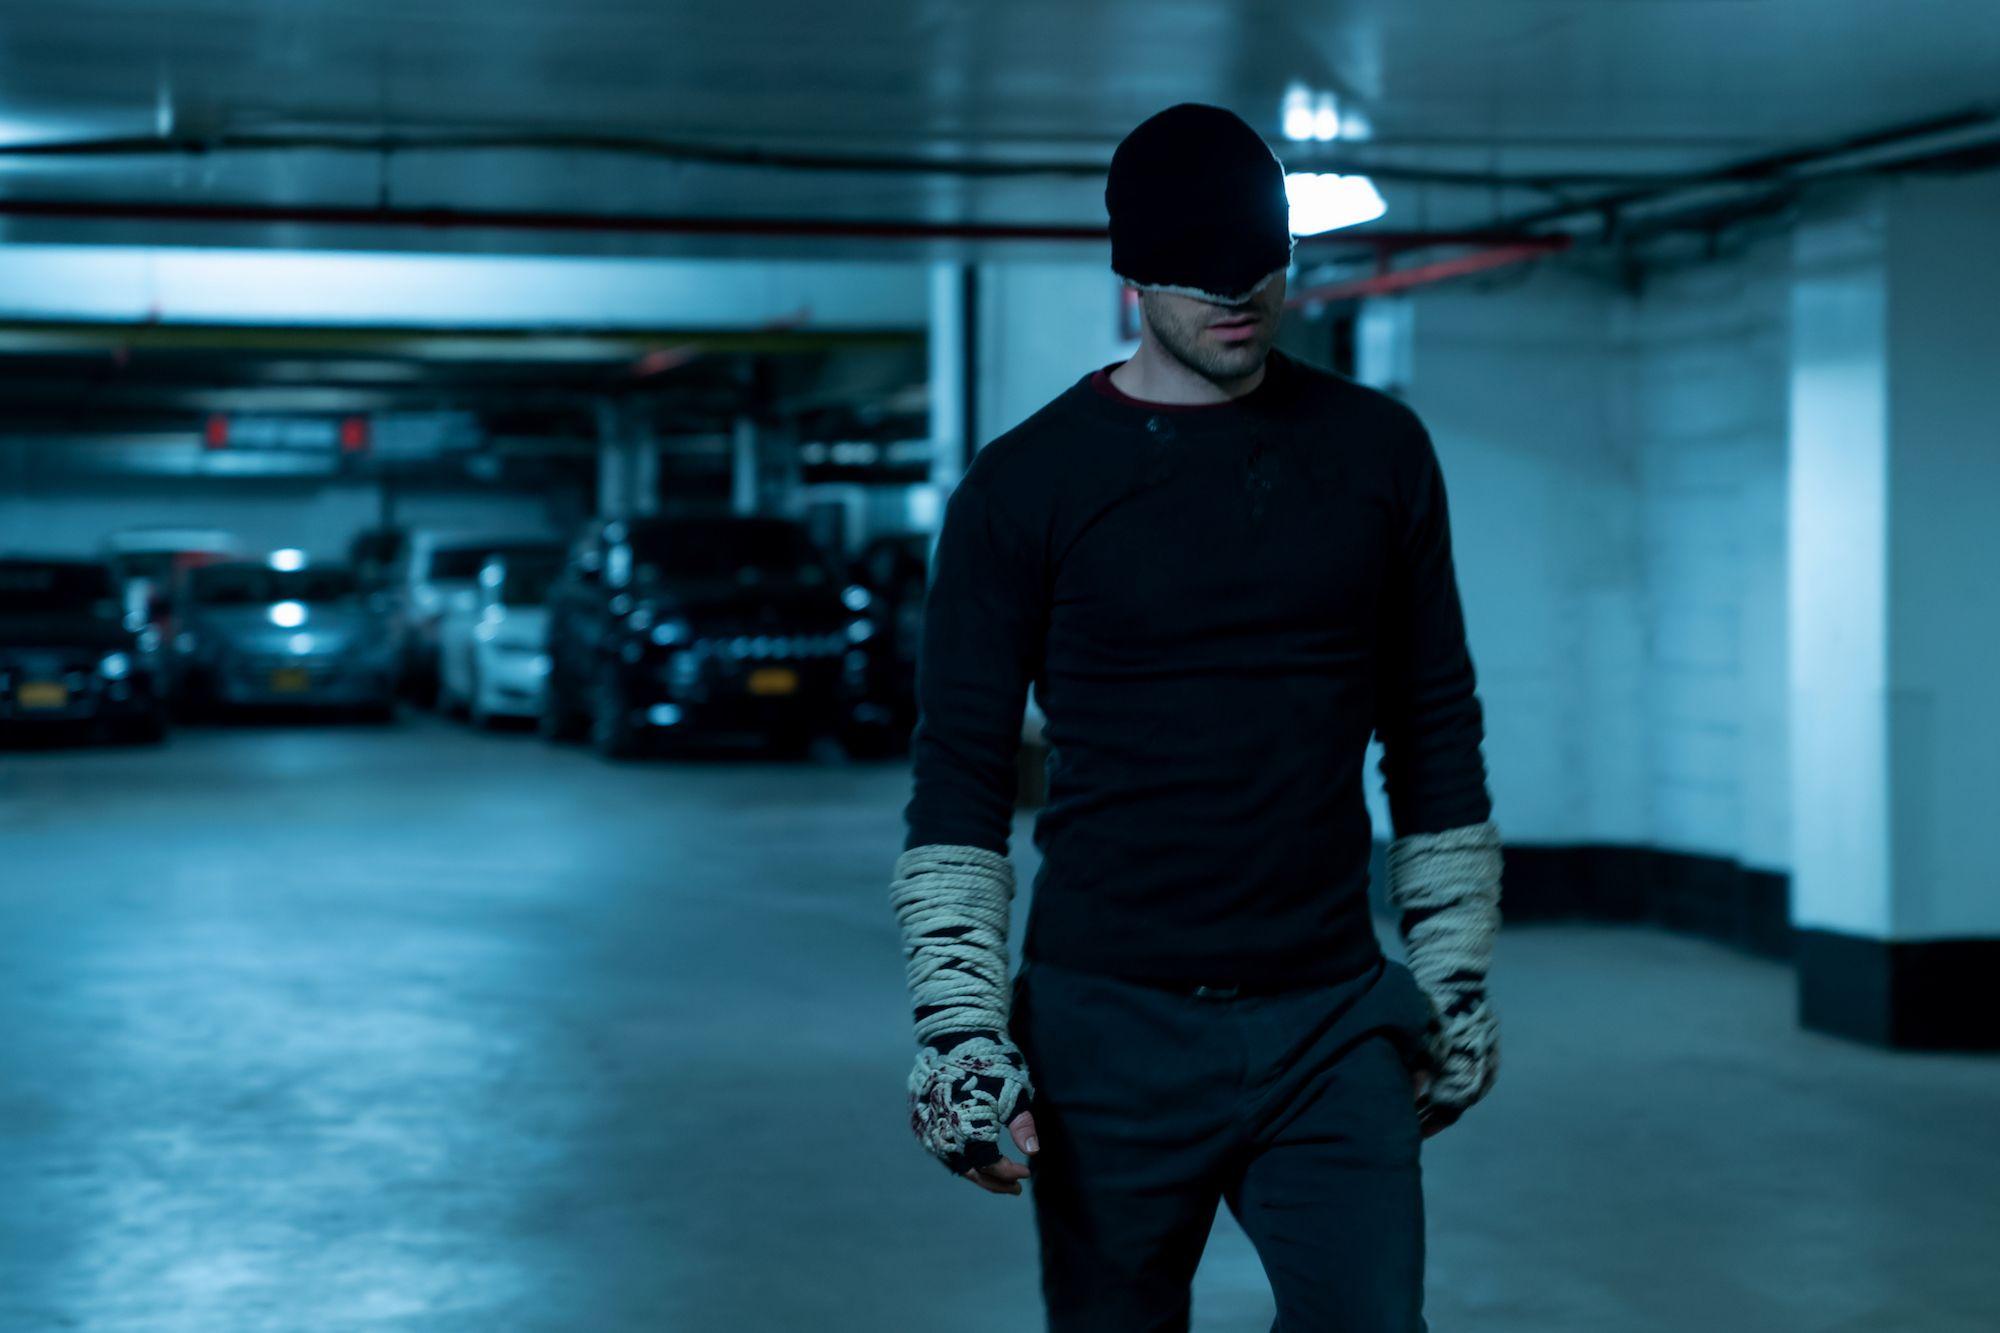 daredevil season 3 - photo #1